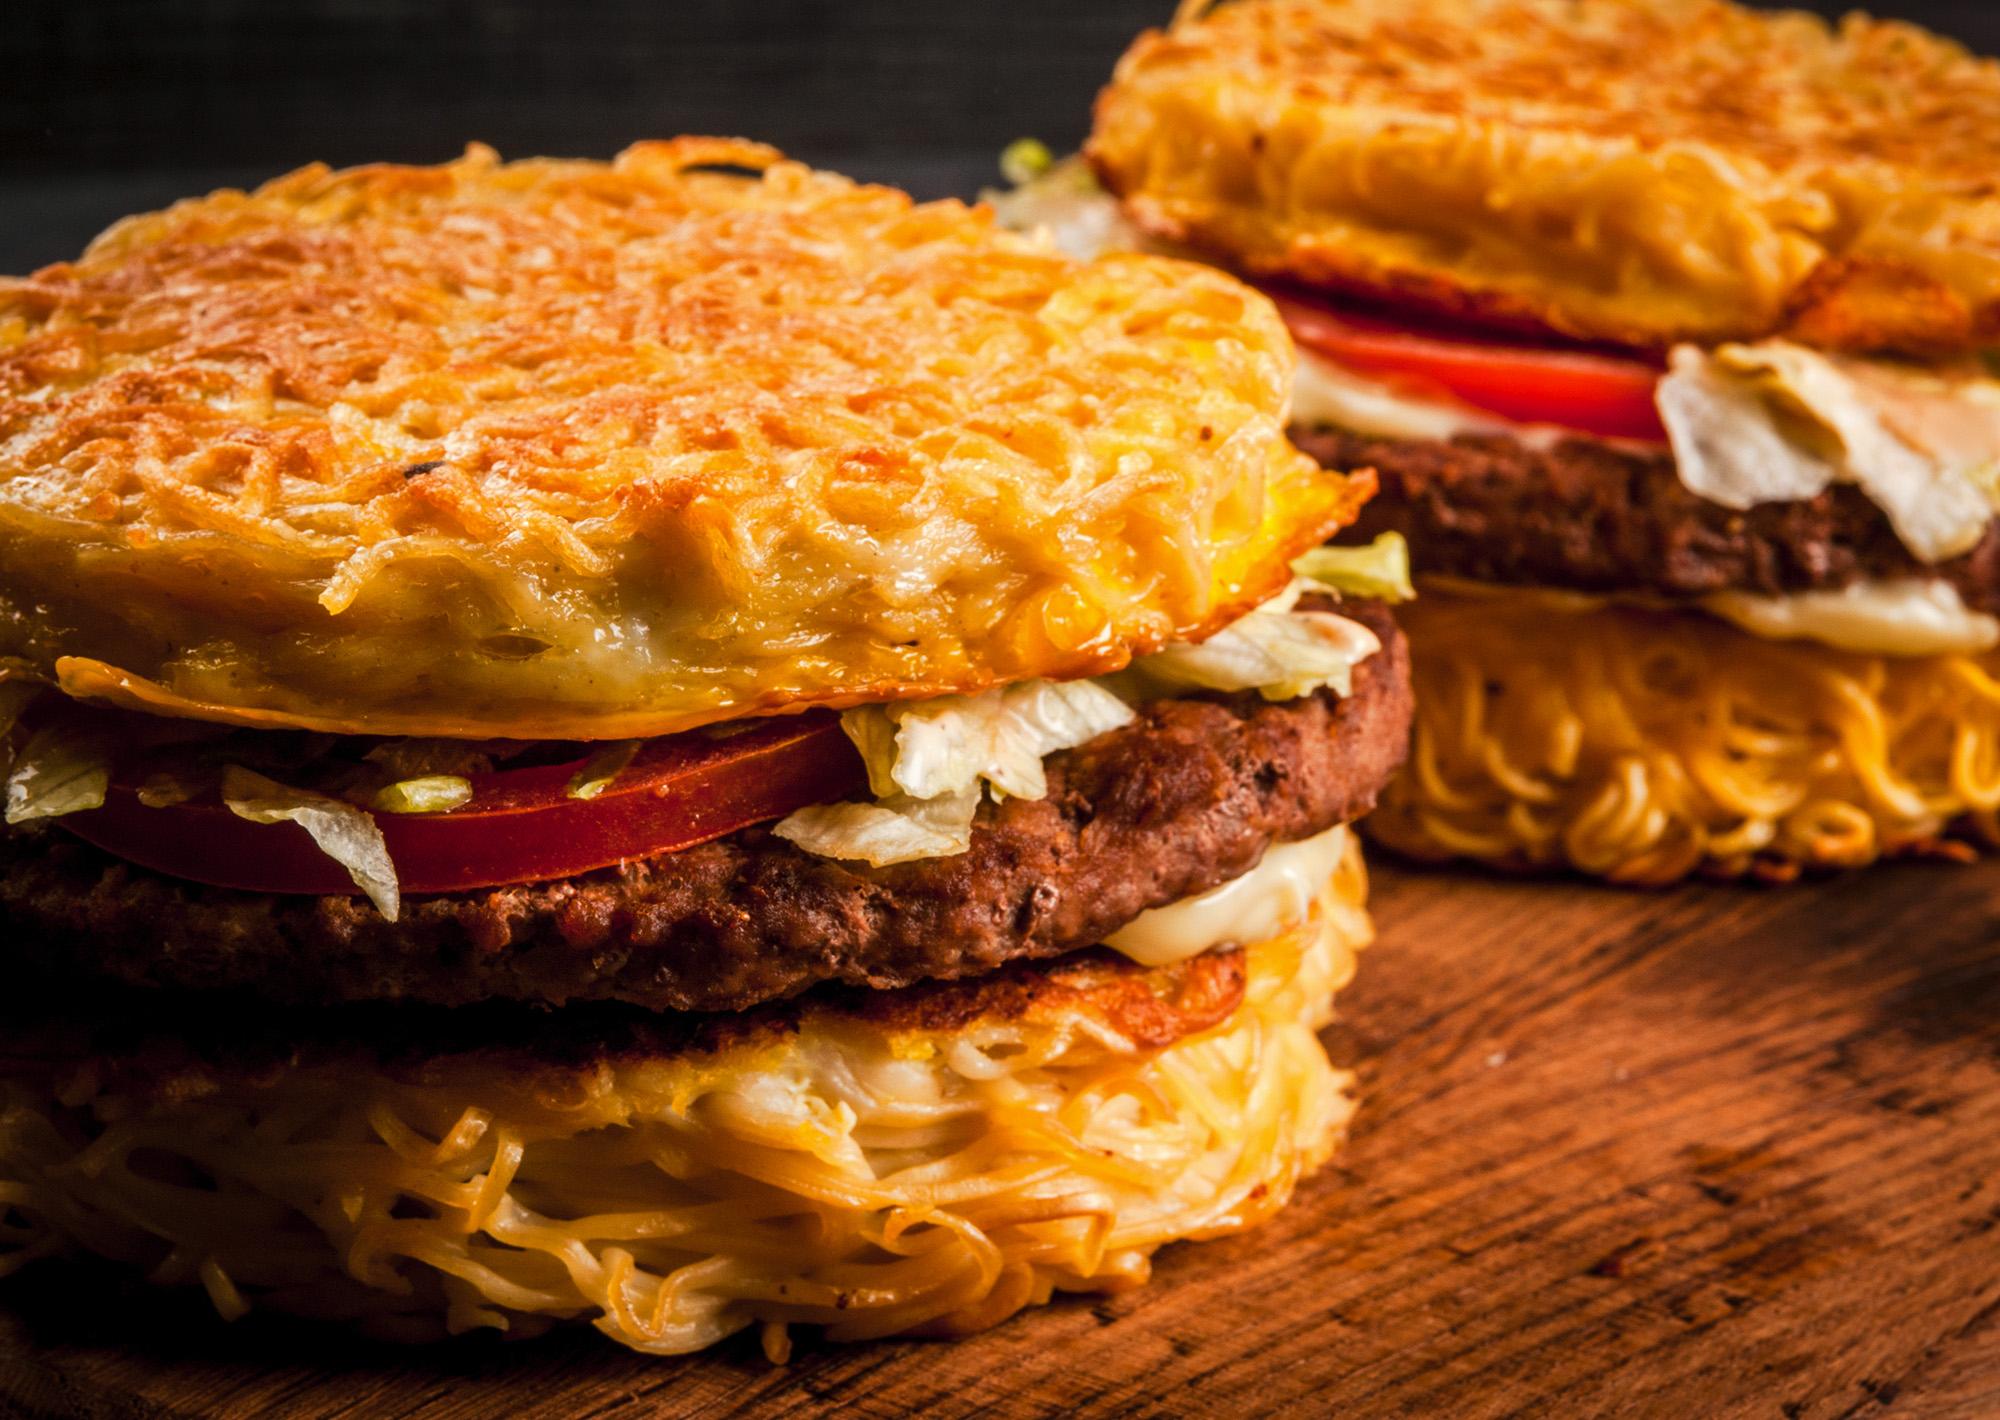 Usaha Makanan Ringan Snack Yang Bisa Jadi Peluang Usaha Kamu